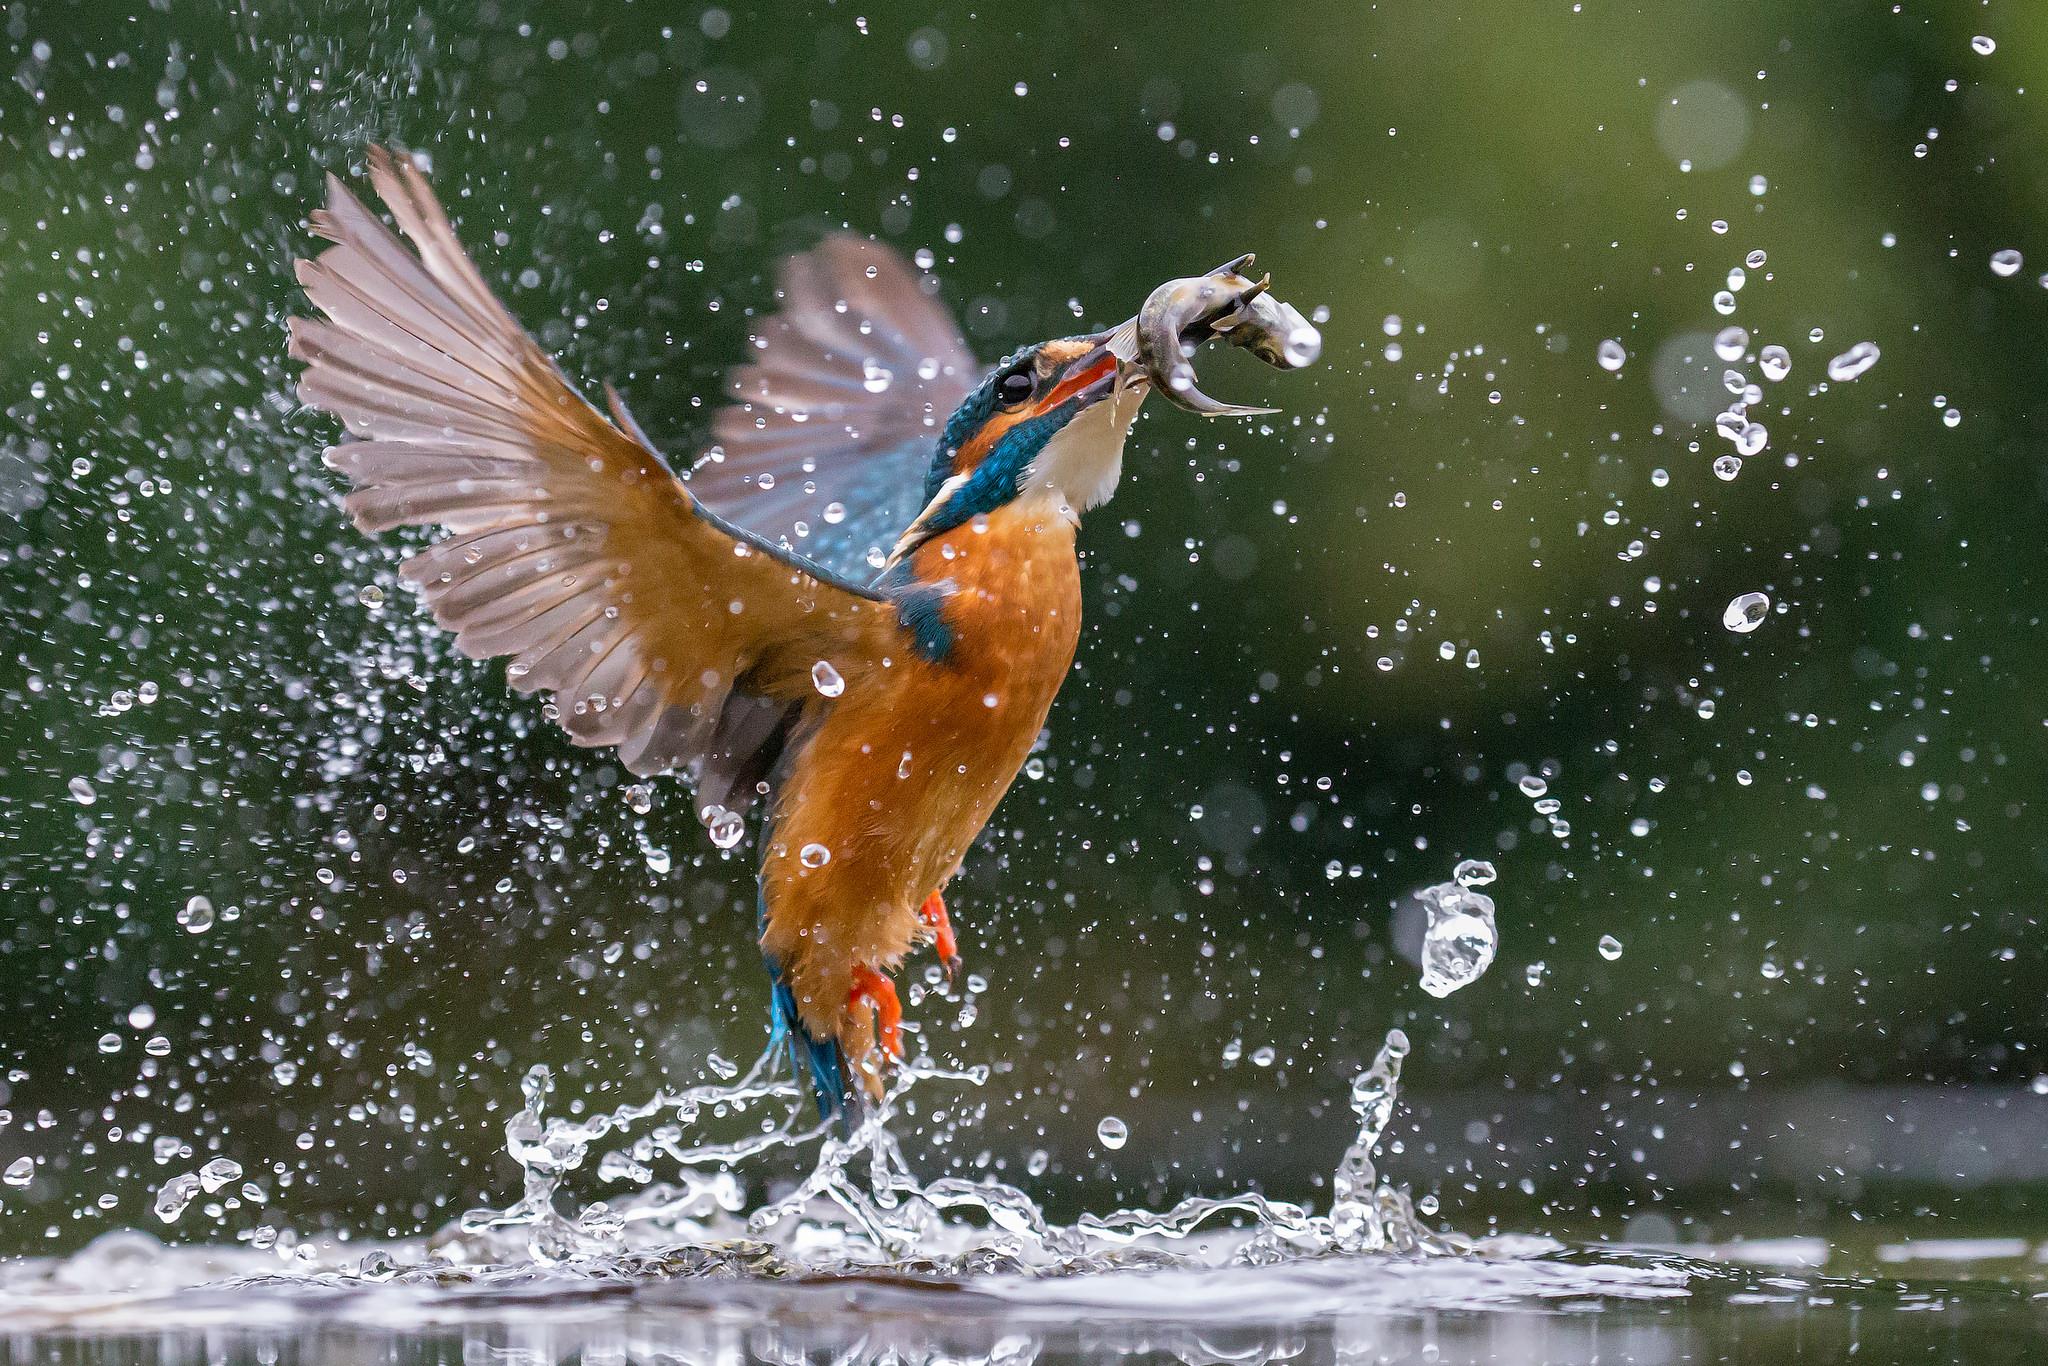 Pajaro cazando peces - 2048x1366